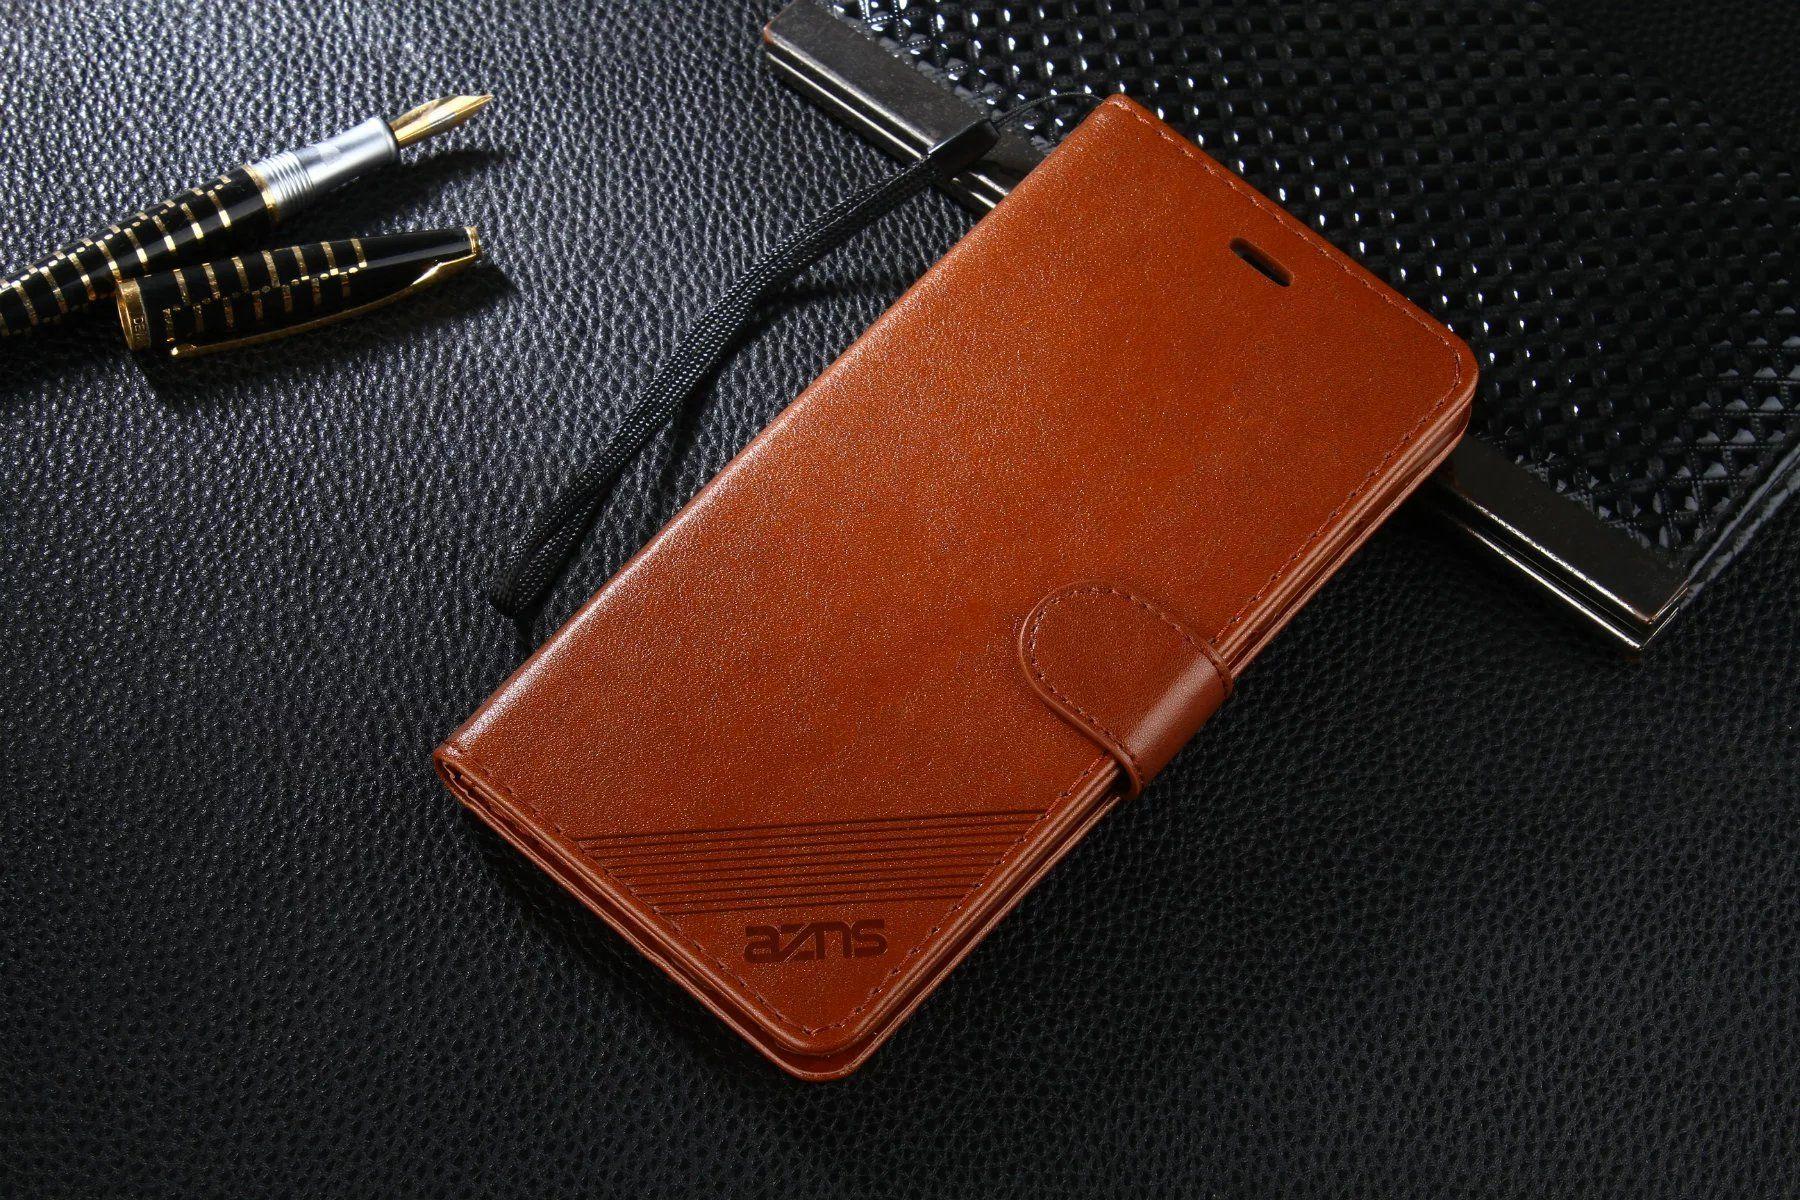 إلى Huawei Honor V9 Case ماركة لطيف Cover Slim Flip غطاء فاخر جلد أصلي لهاتف Huawei Honor V9